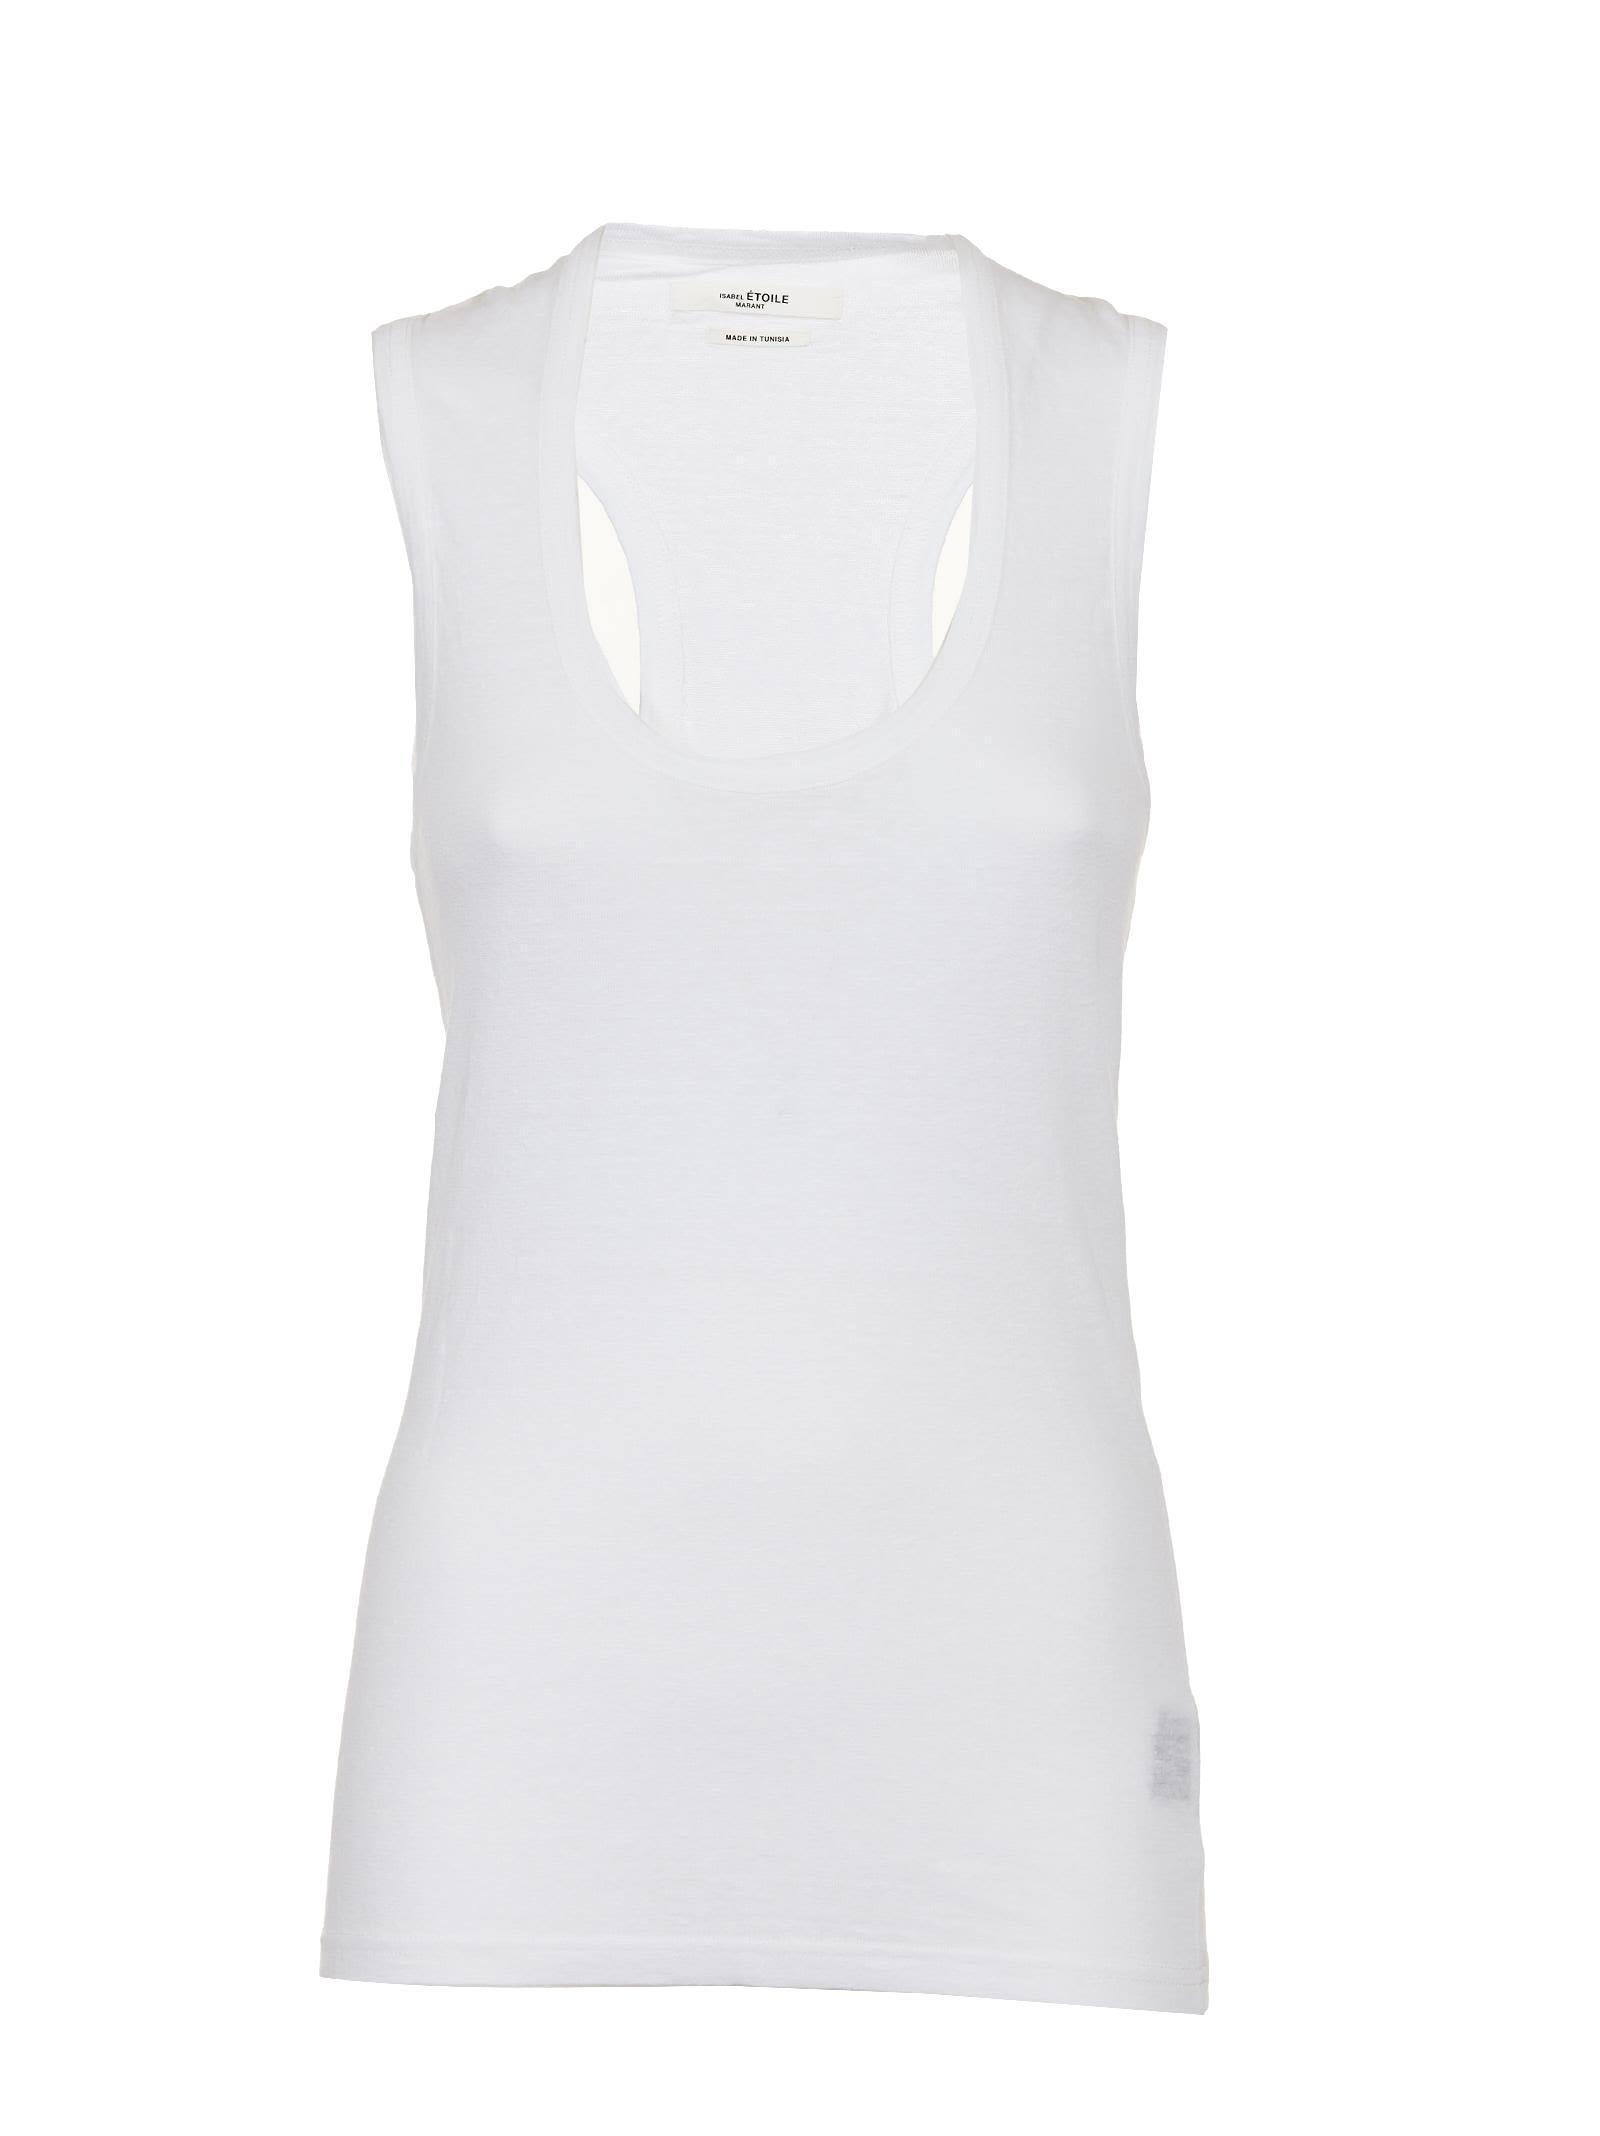 Etoile Isabel Marant Isabel Marant Étoile Koby Tank Top In Bianco